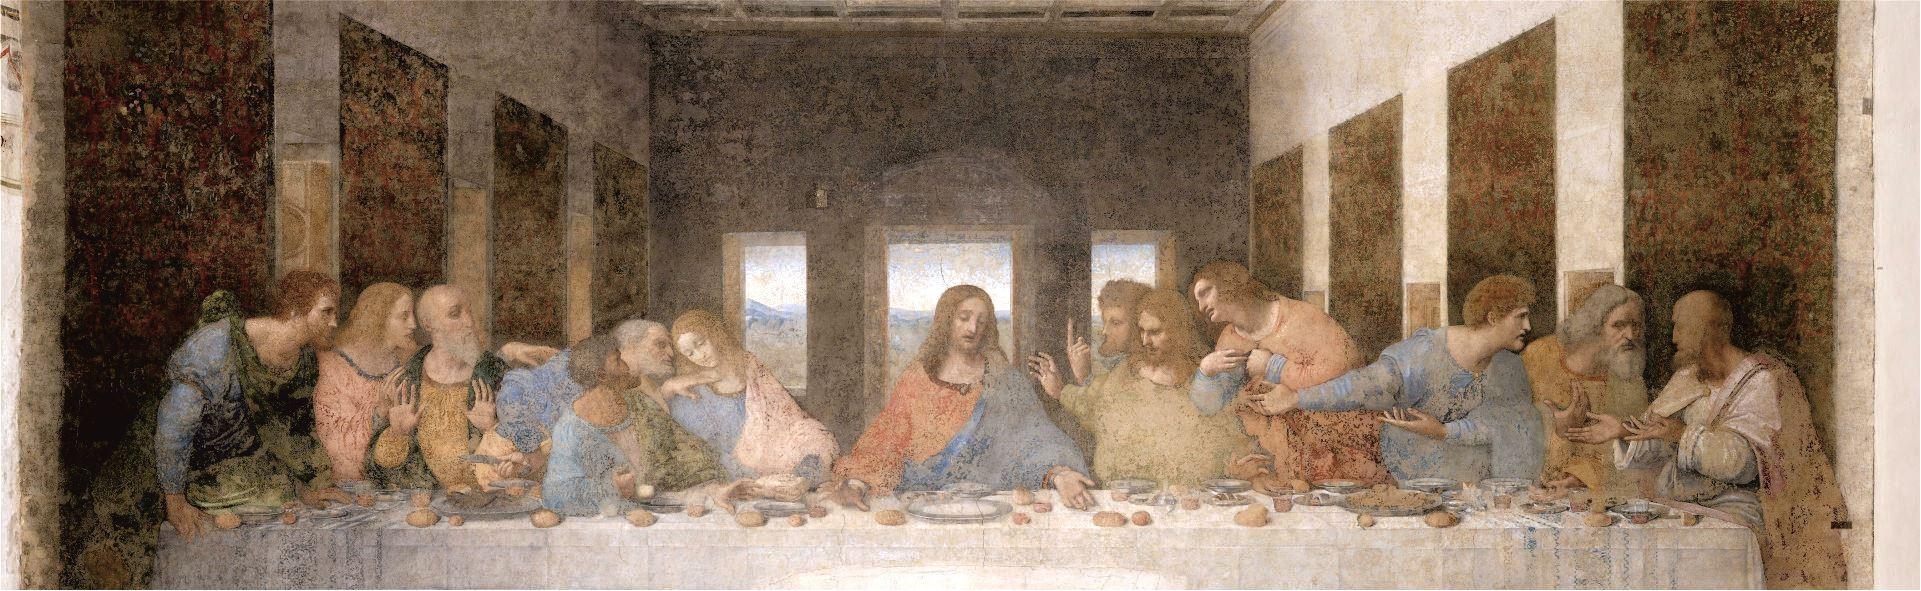 Calendario Liturgico Maranatha.Area Liturgia Santuario Sant Anna Caserta